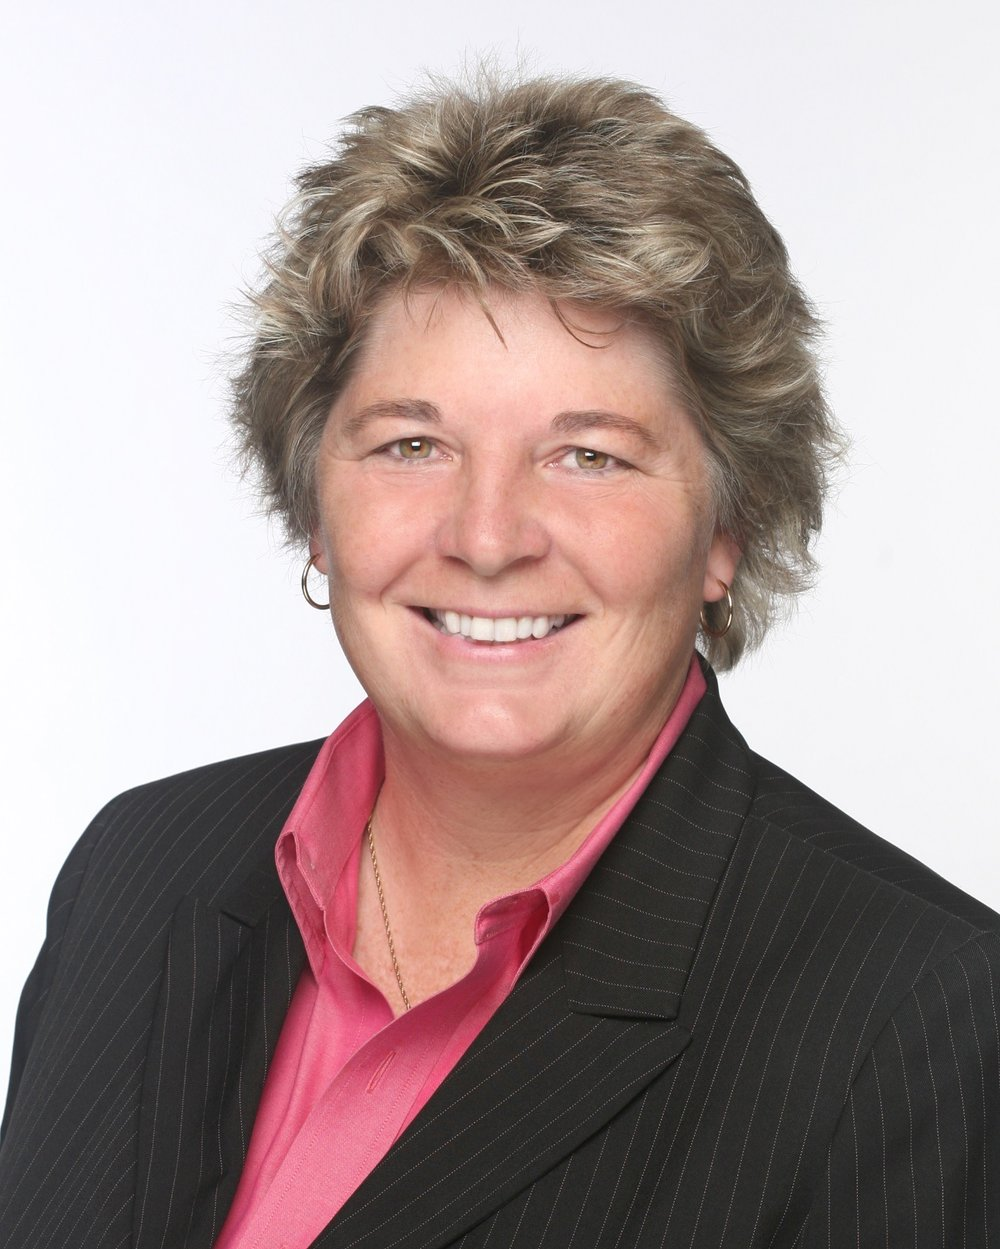 Marci Bair Fianacial Planner,Philanthropist